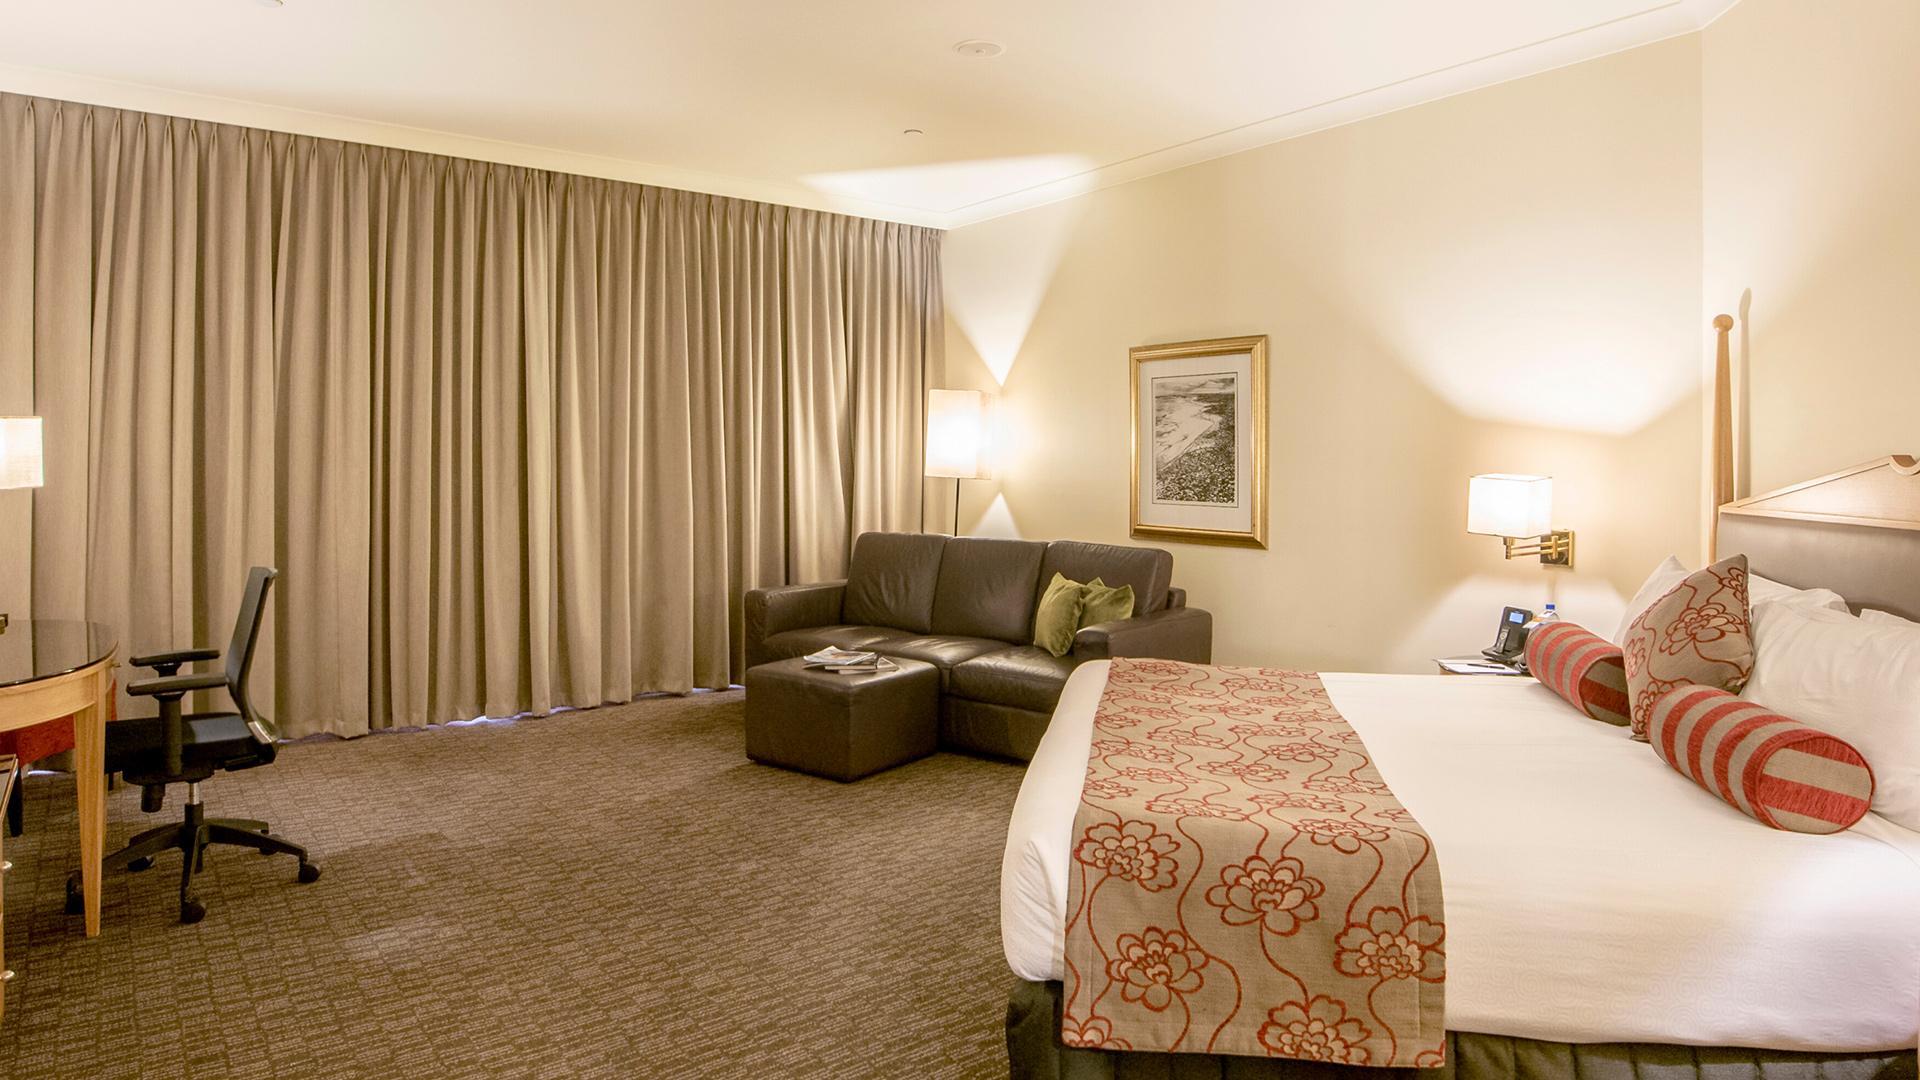 Club King City View image 1 at Duxton Hotel Perth by City of Perth, Western Australia, Australia